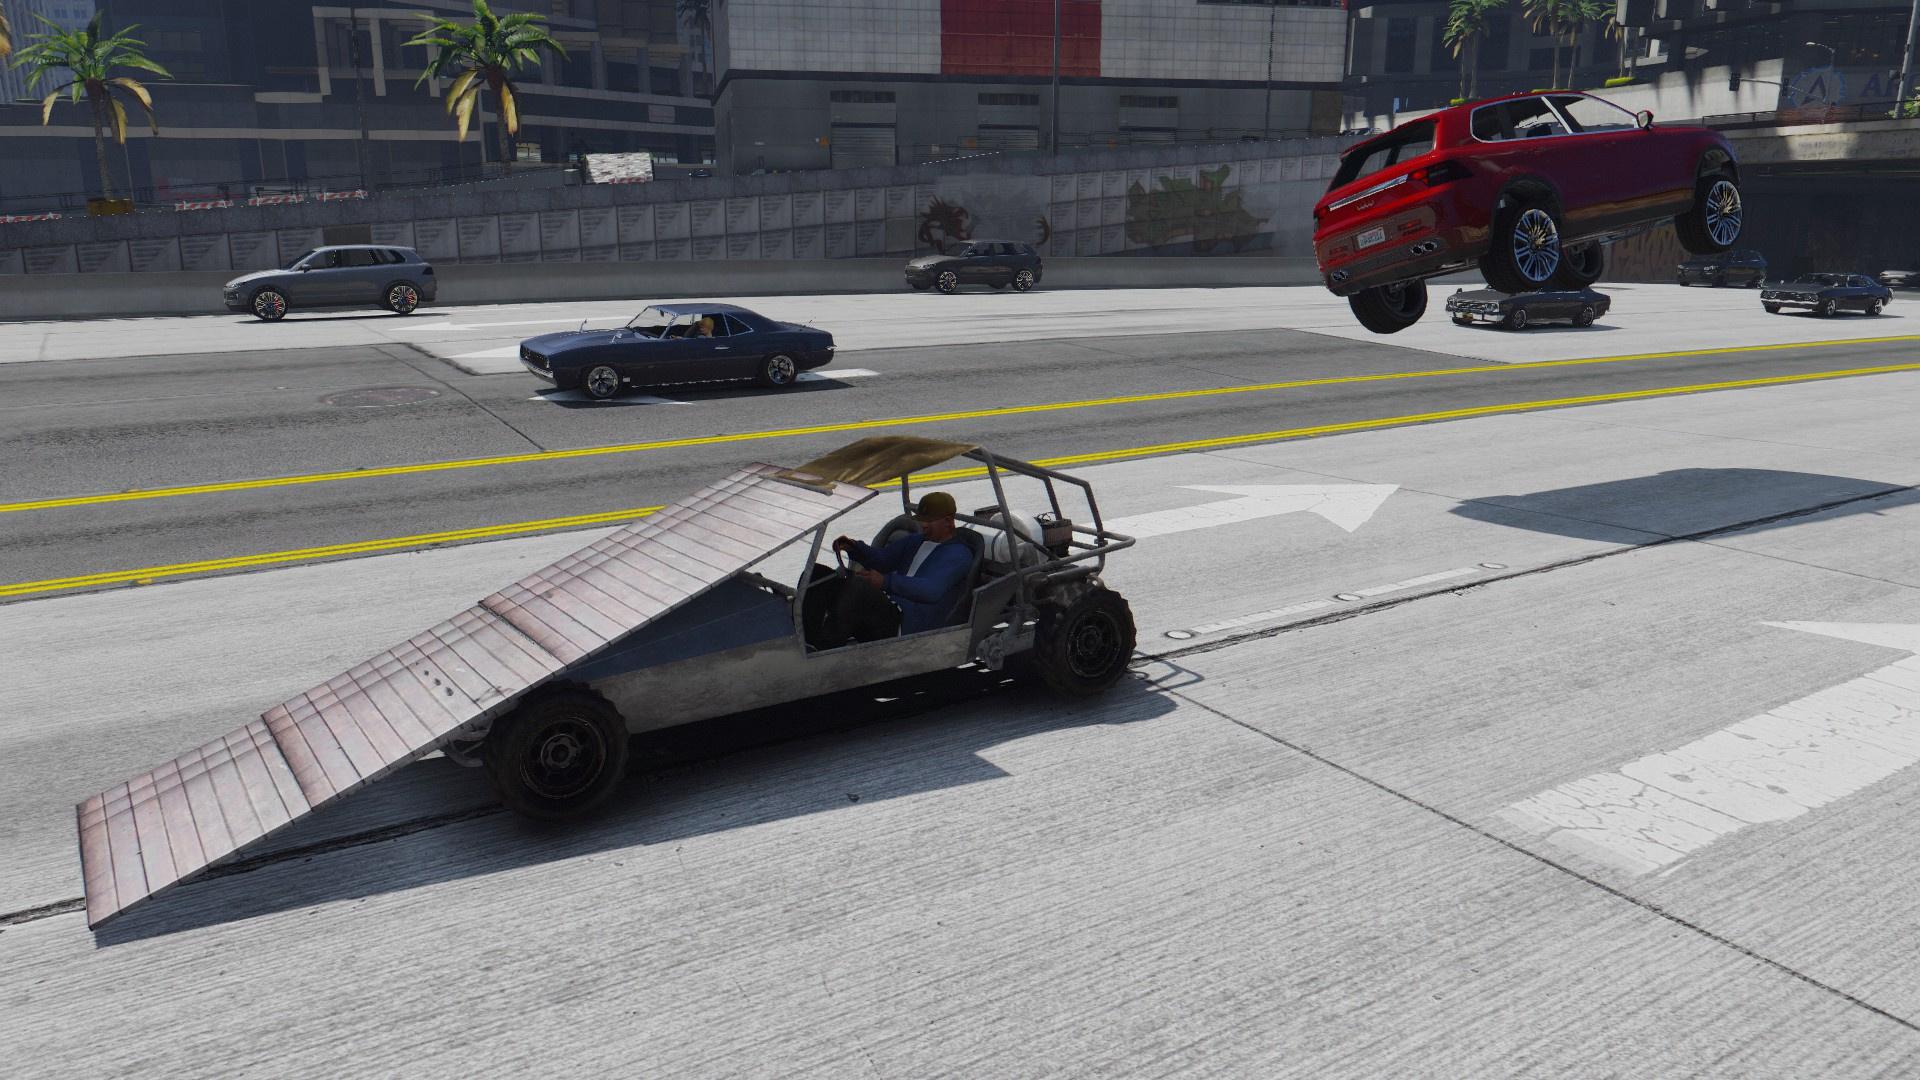 Flip Car (Ramp Car) [Menyoo] - GTA5-Mods com